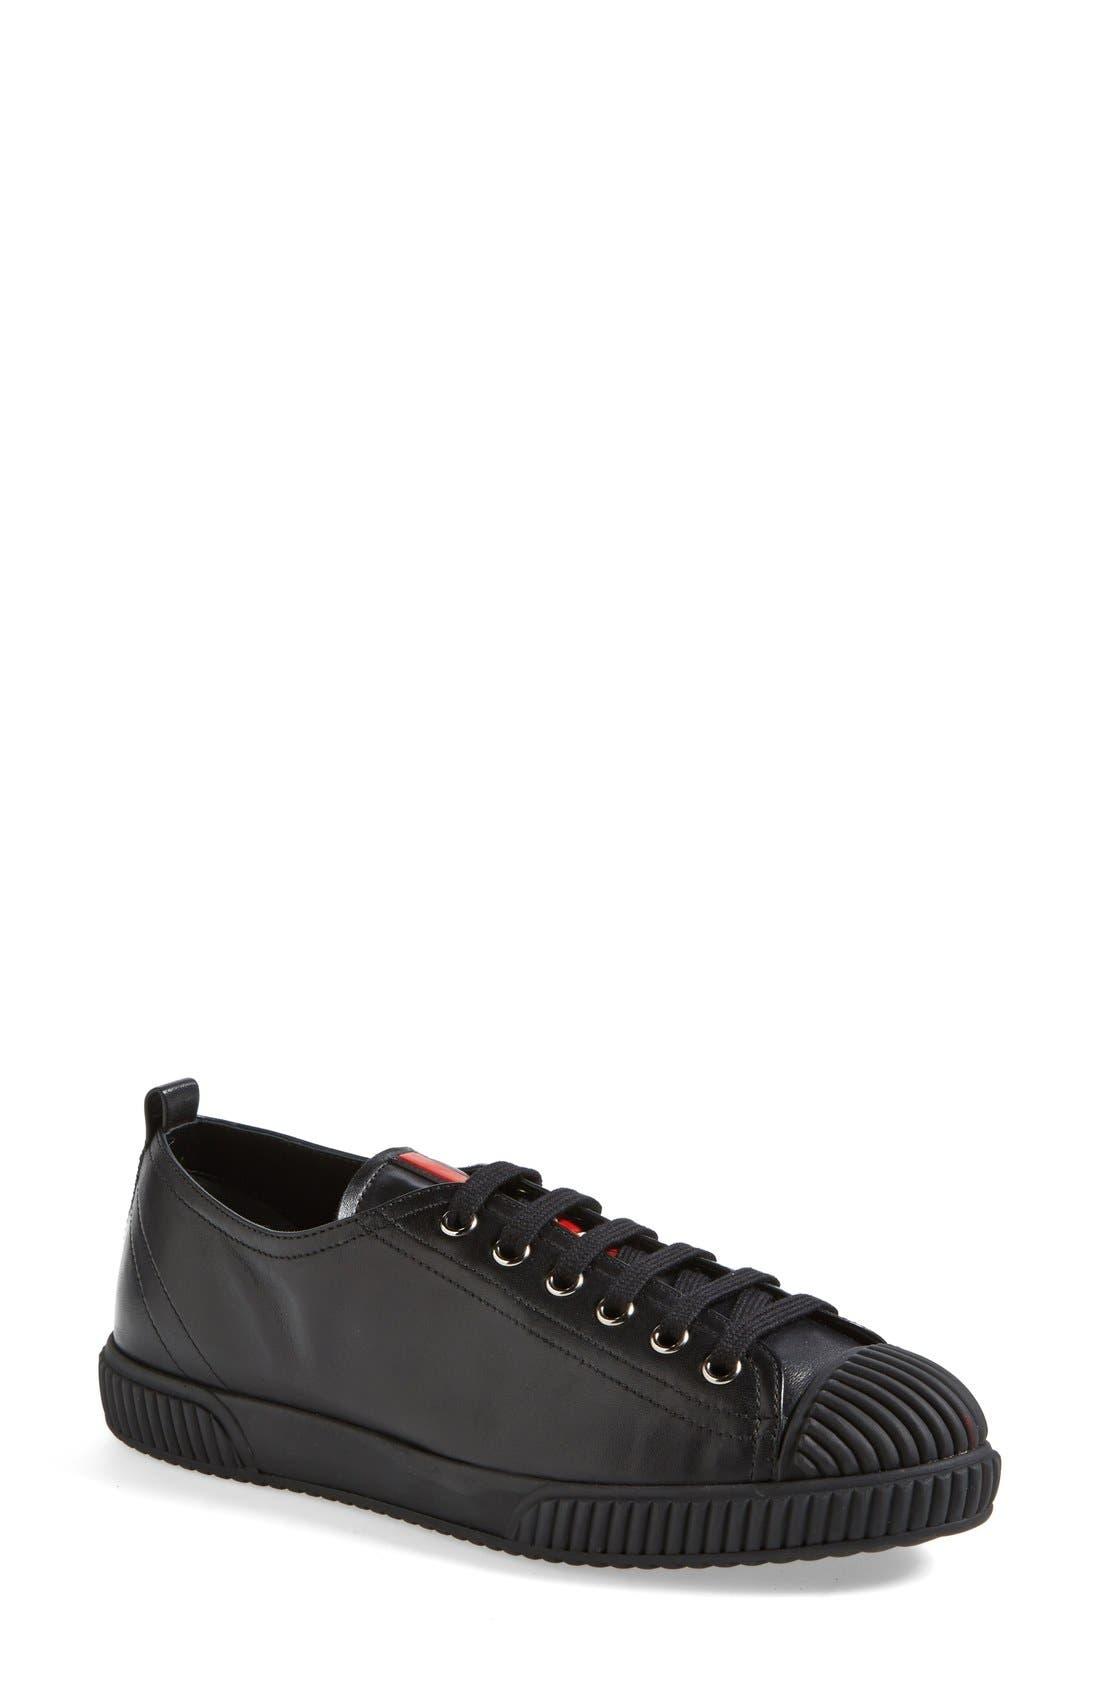 PRADA, Cap Toe Sneaker, Main thumbnail 1, color, 001